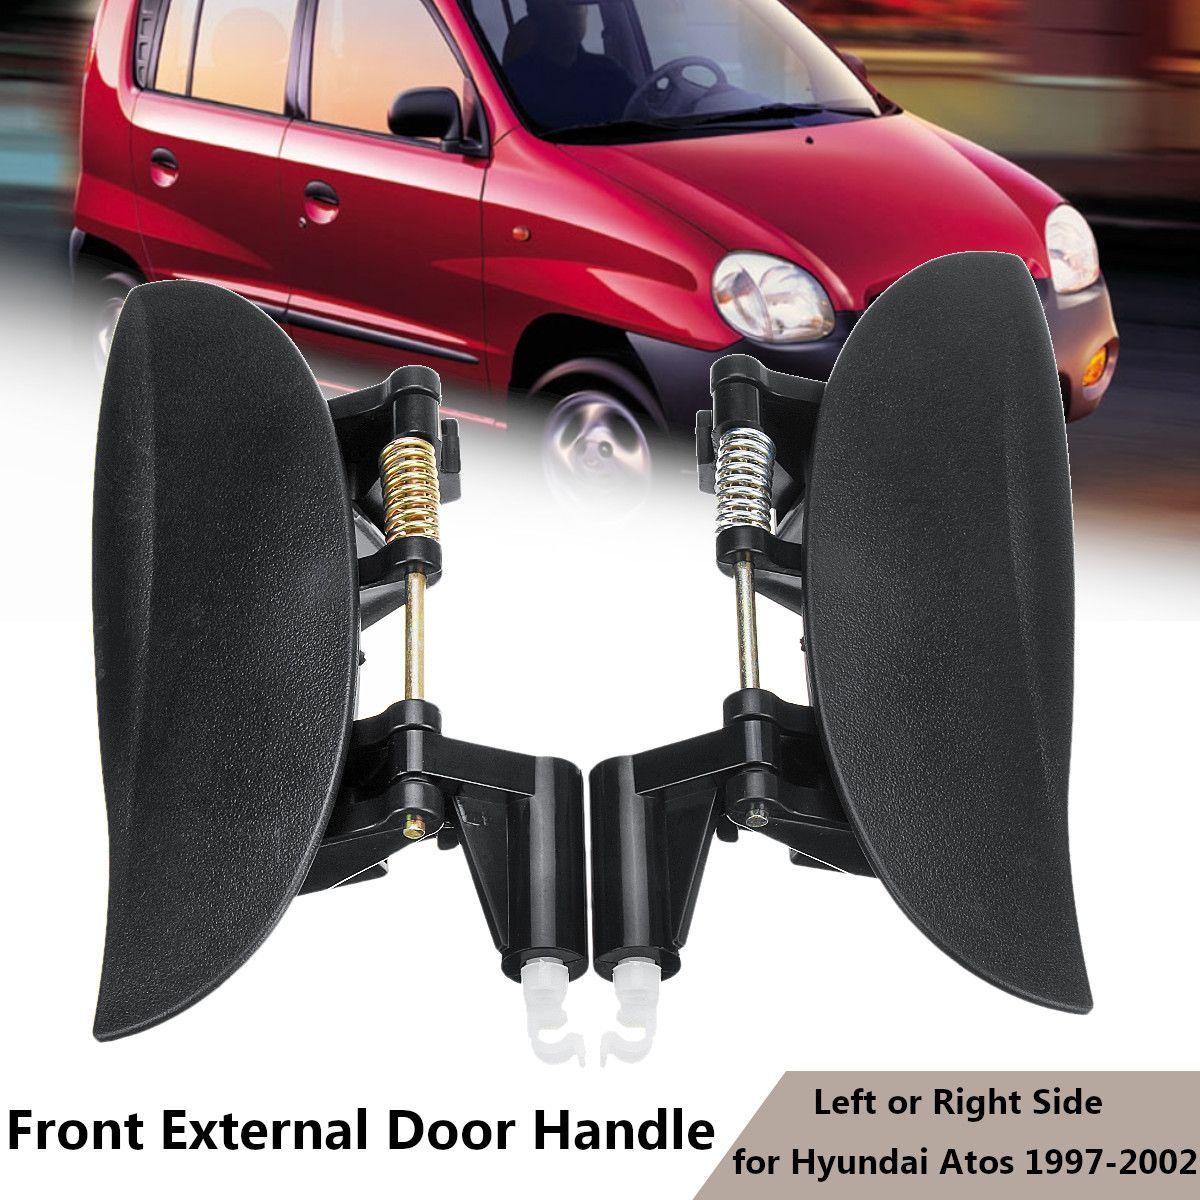 4PCS Exterior Left Right Door Handles for Hyundai Amica Atos Front +Rear